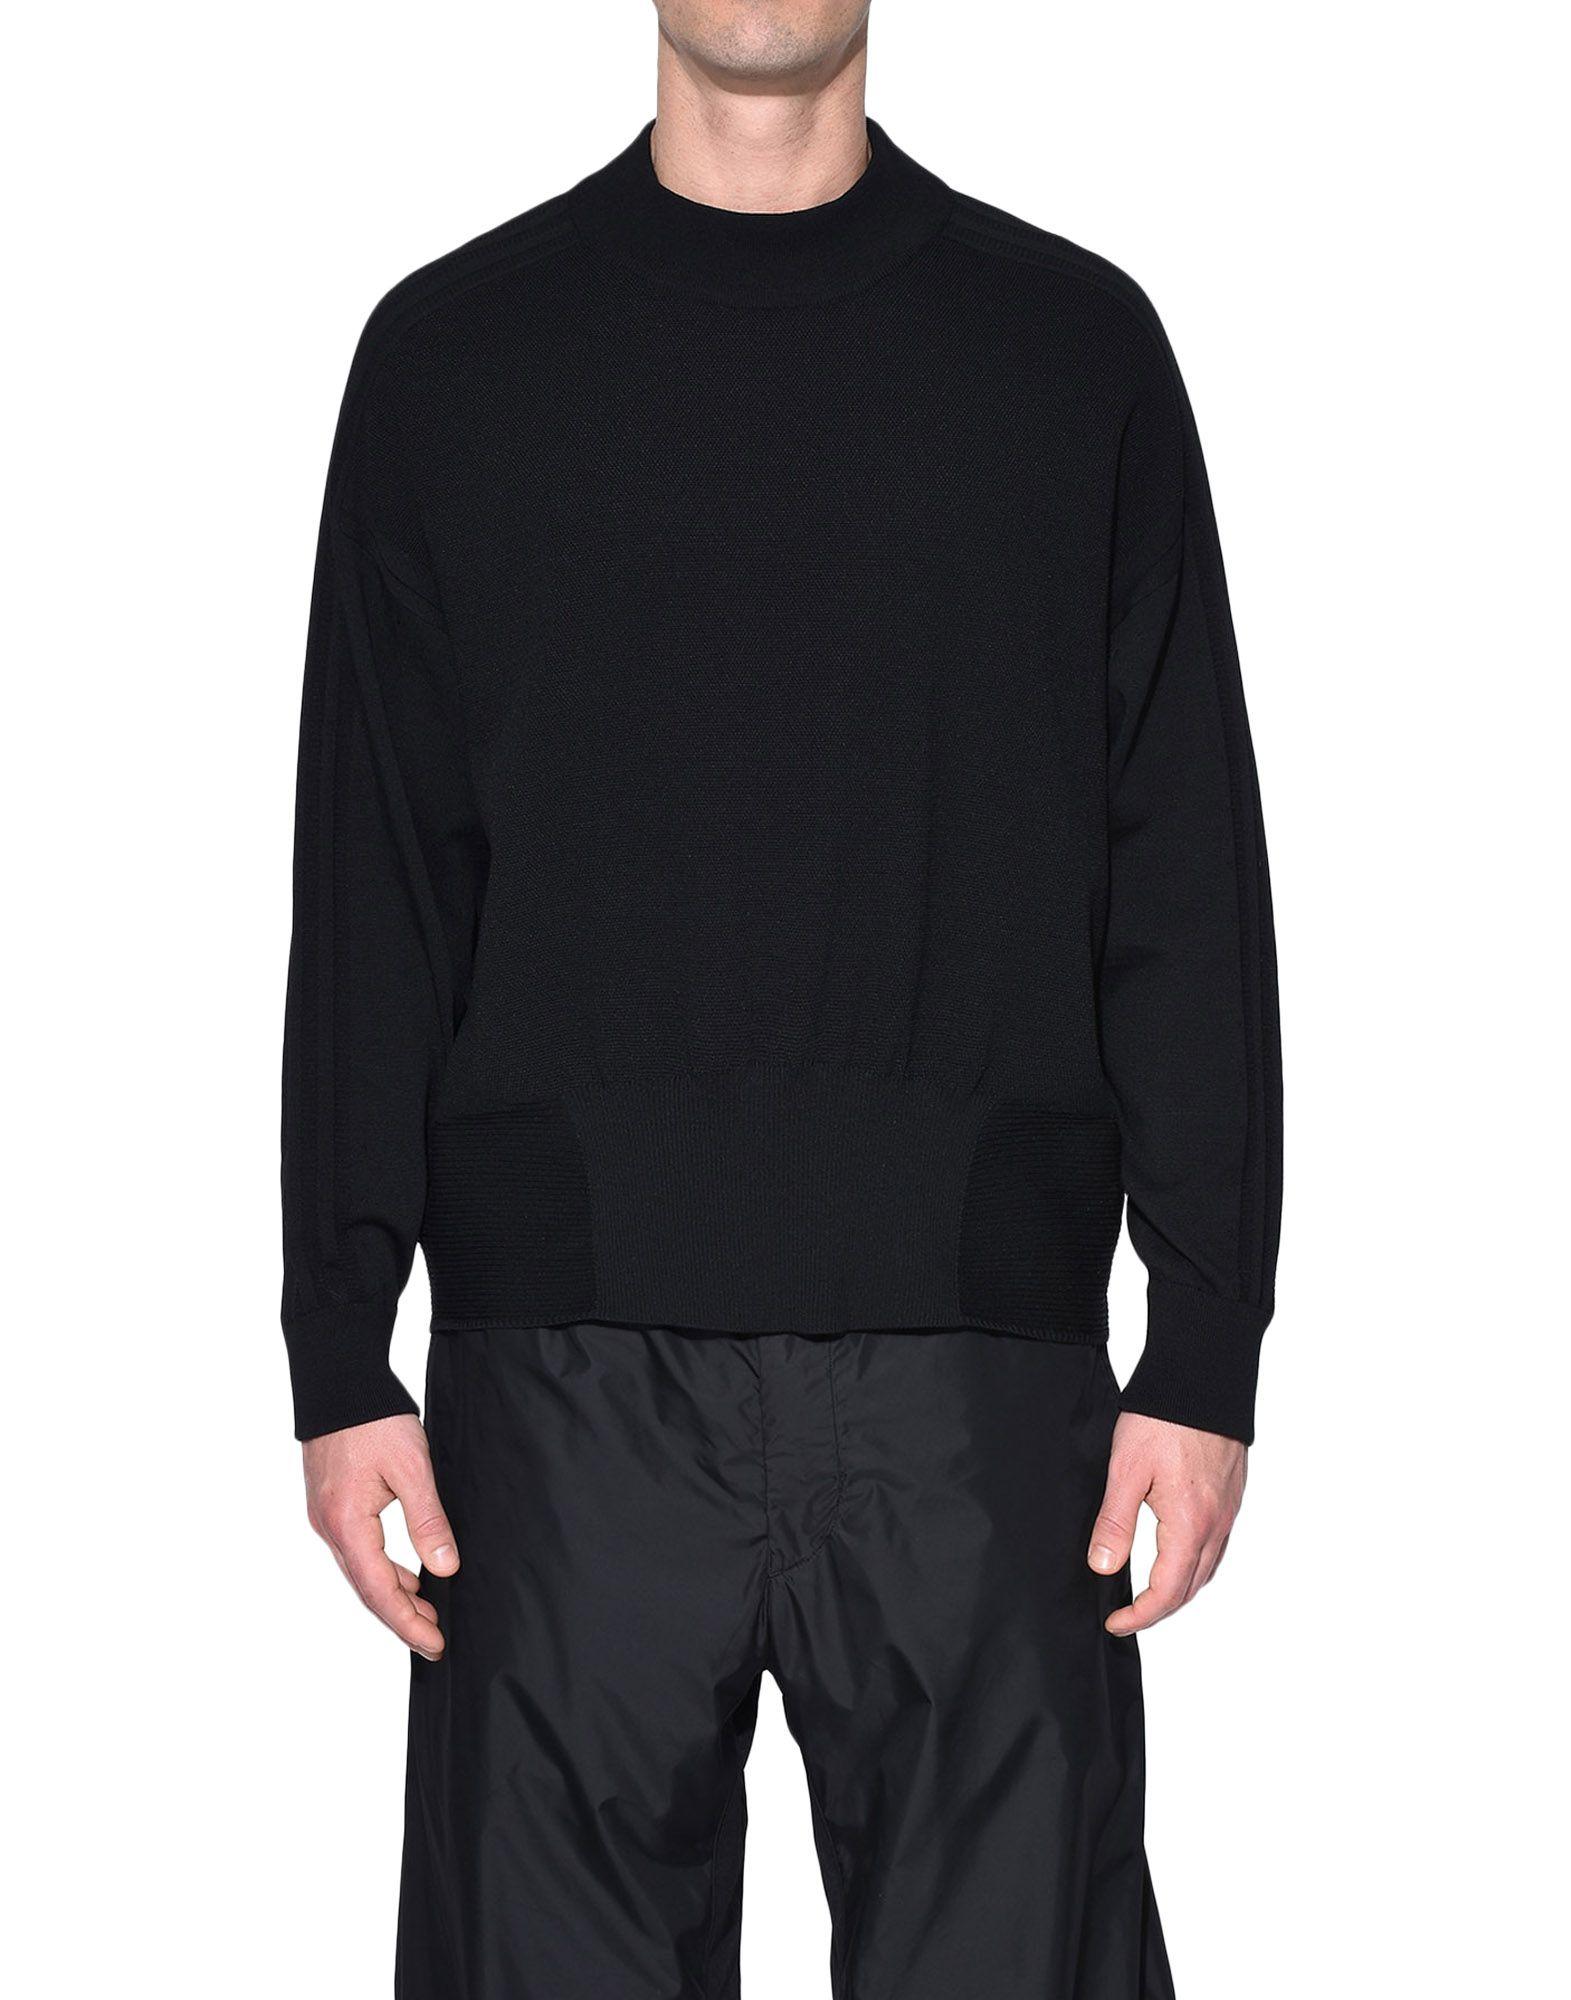 Y-3 Y-3 Tech Wool Sweater Long sleeve jumper Man r